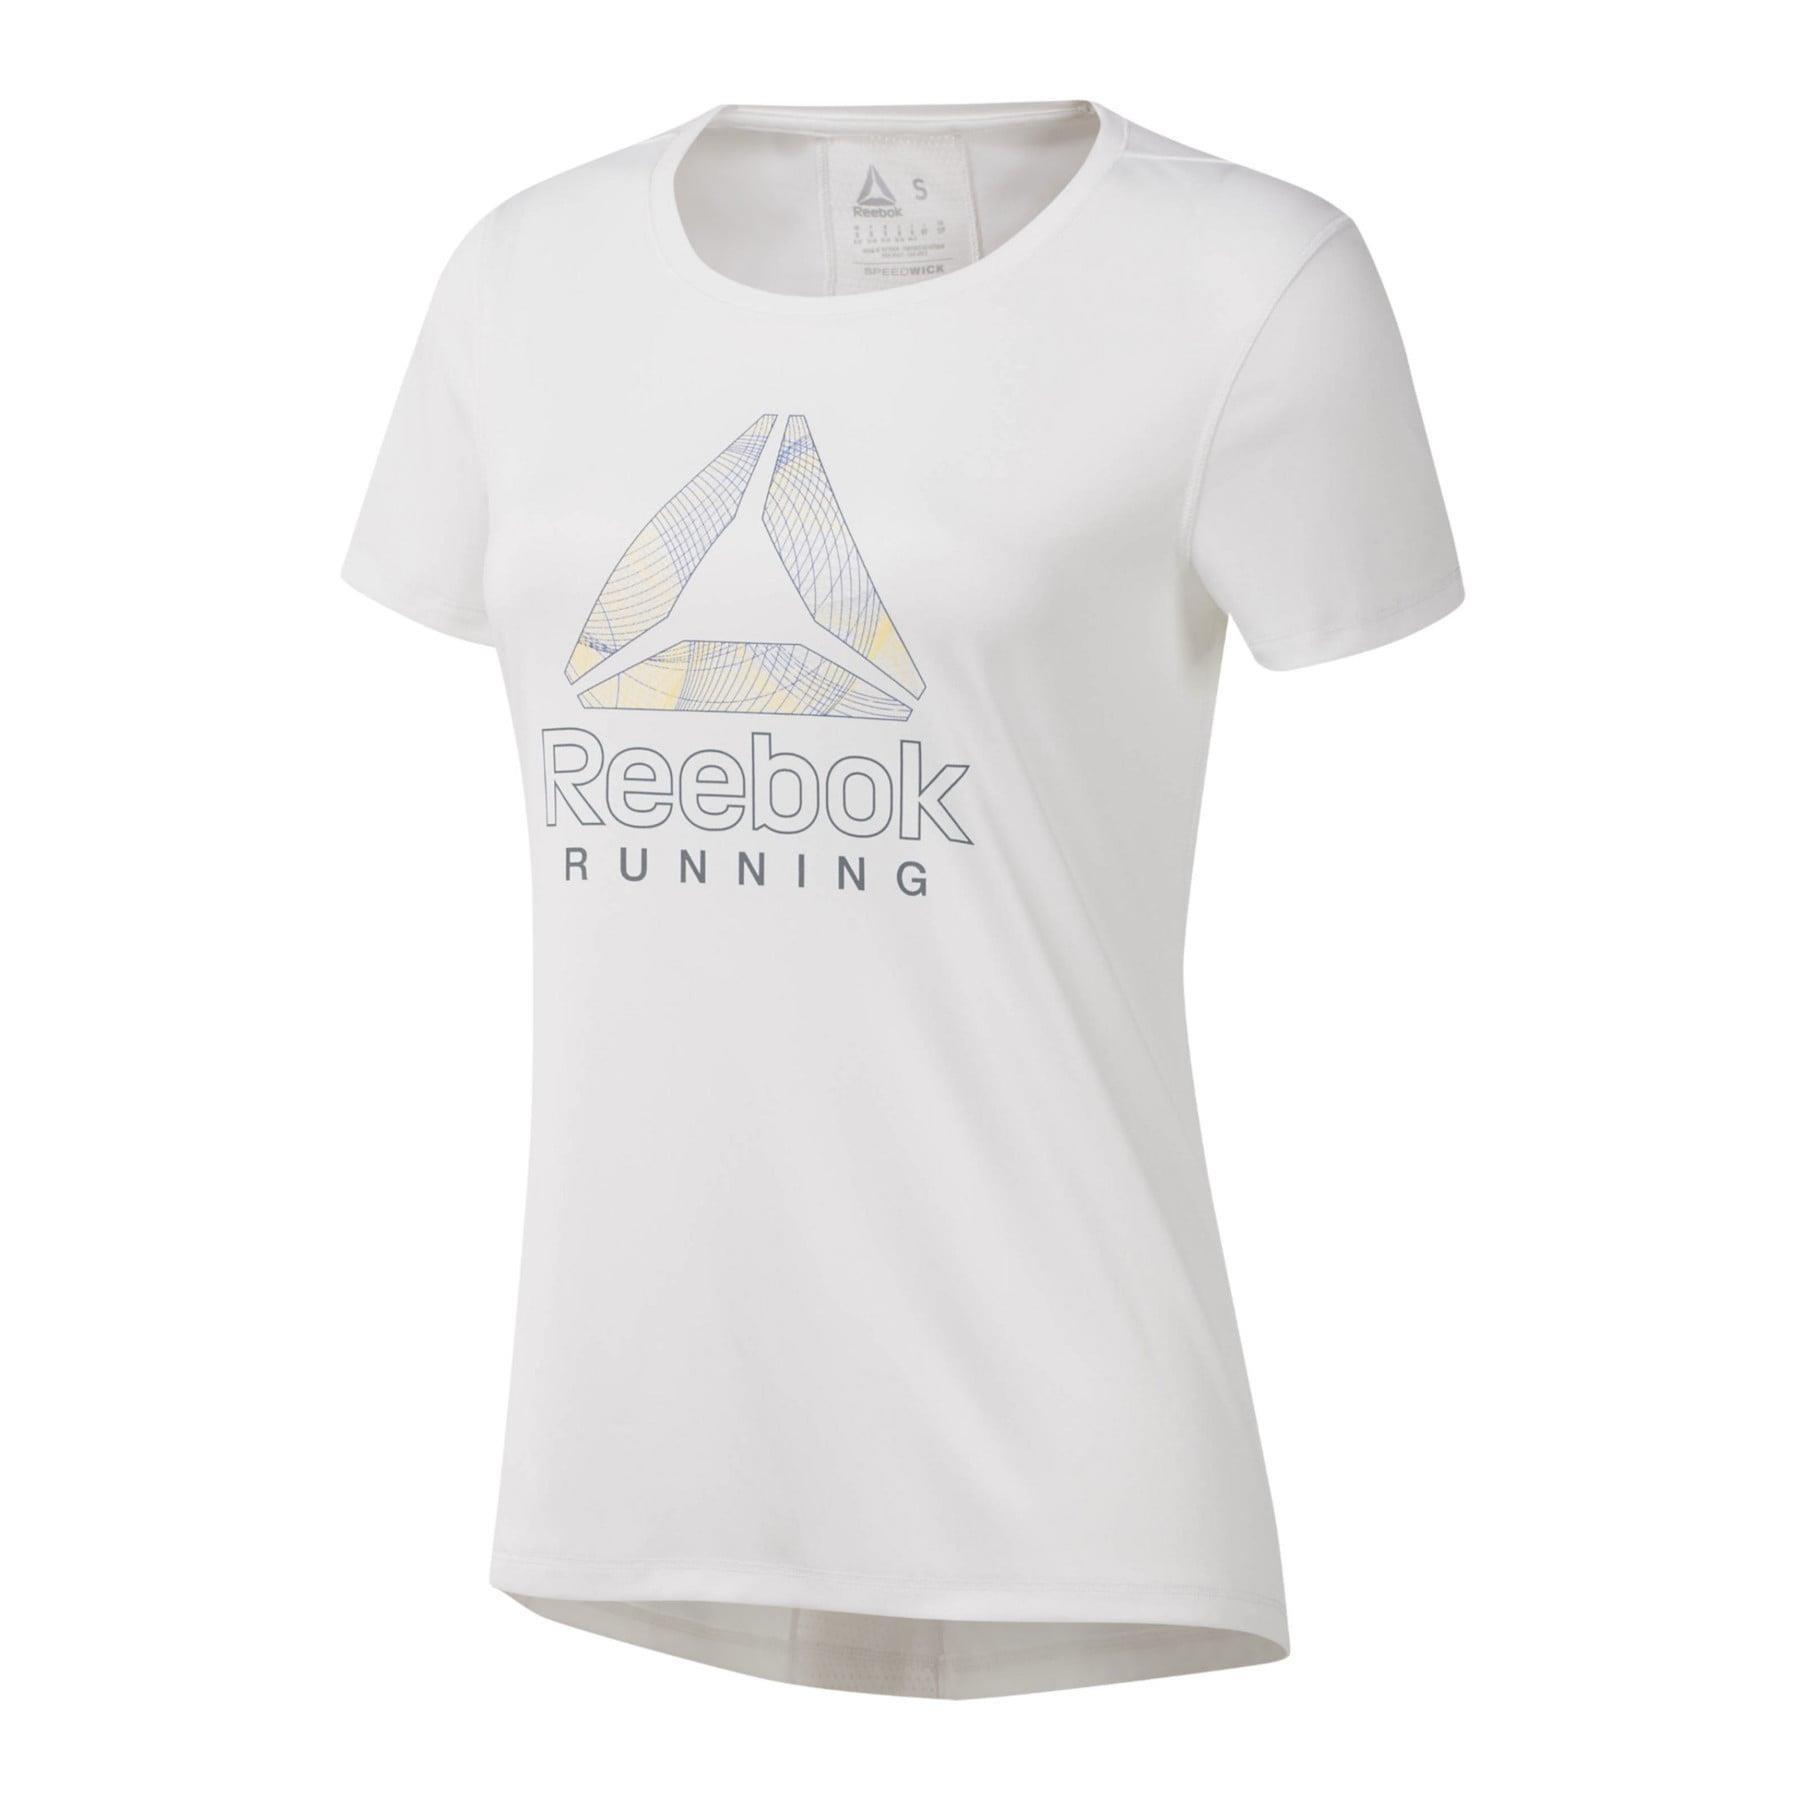 Koszulka Reebok Running DU4264 DU4264-a1 r XL